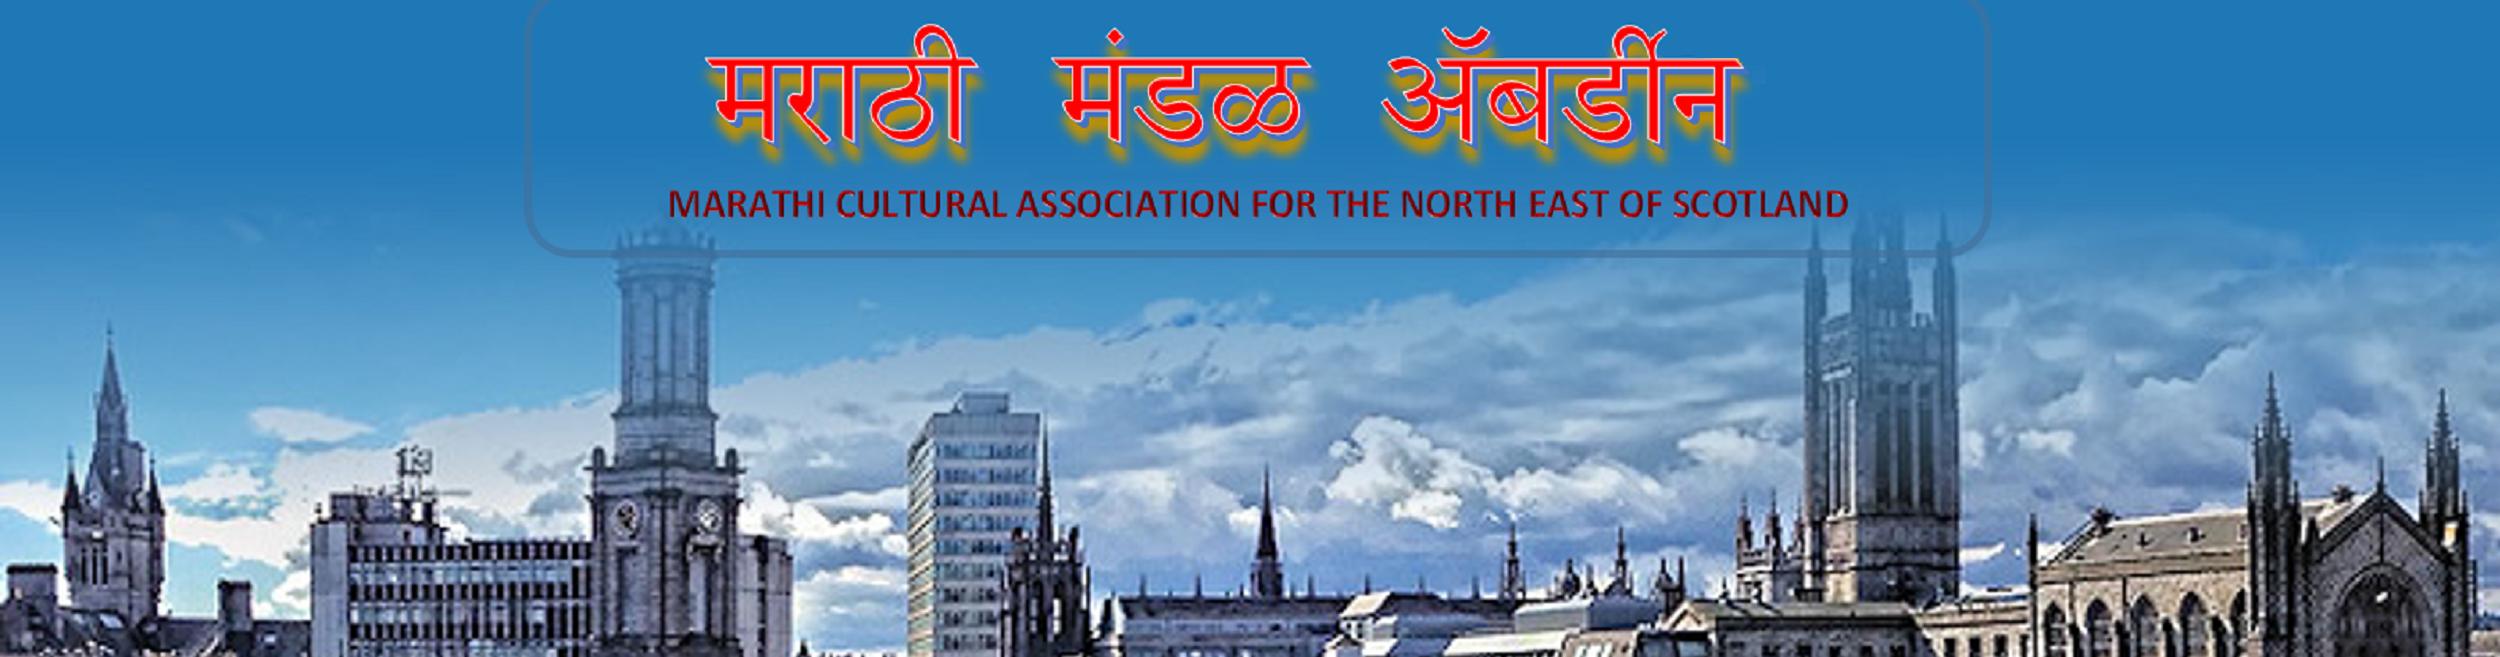 Marathi Cultural Organisation for North East of Scotland